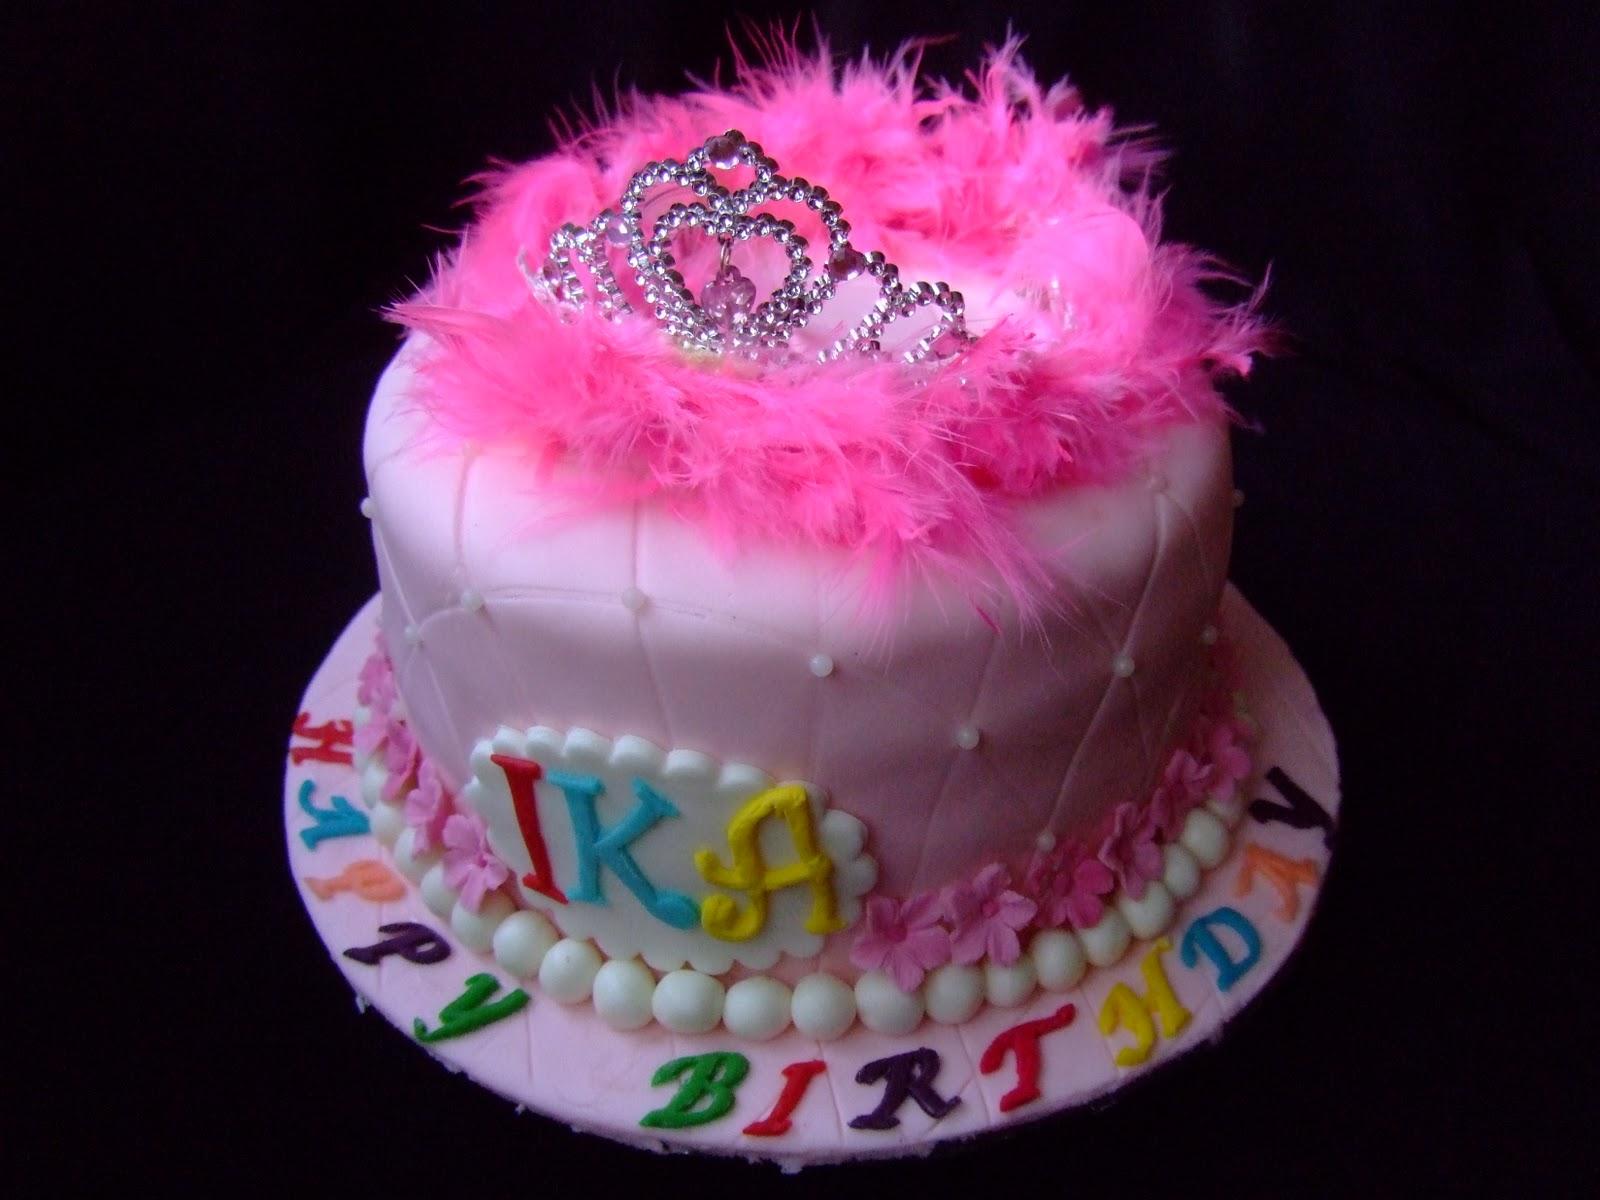 junsdelicioustreats: Princess crown birthday cake